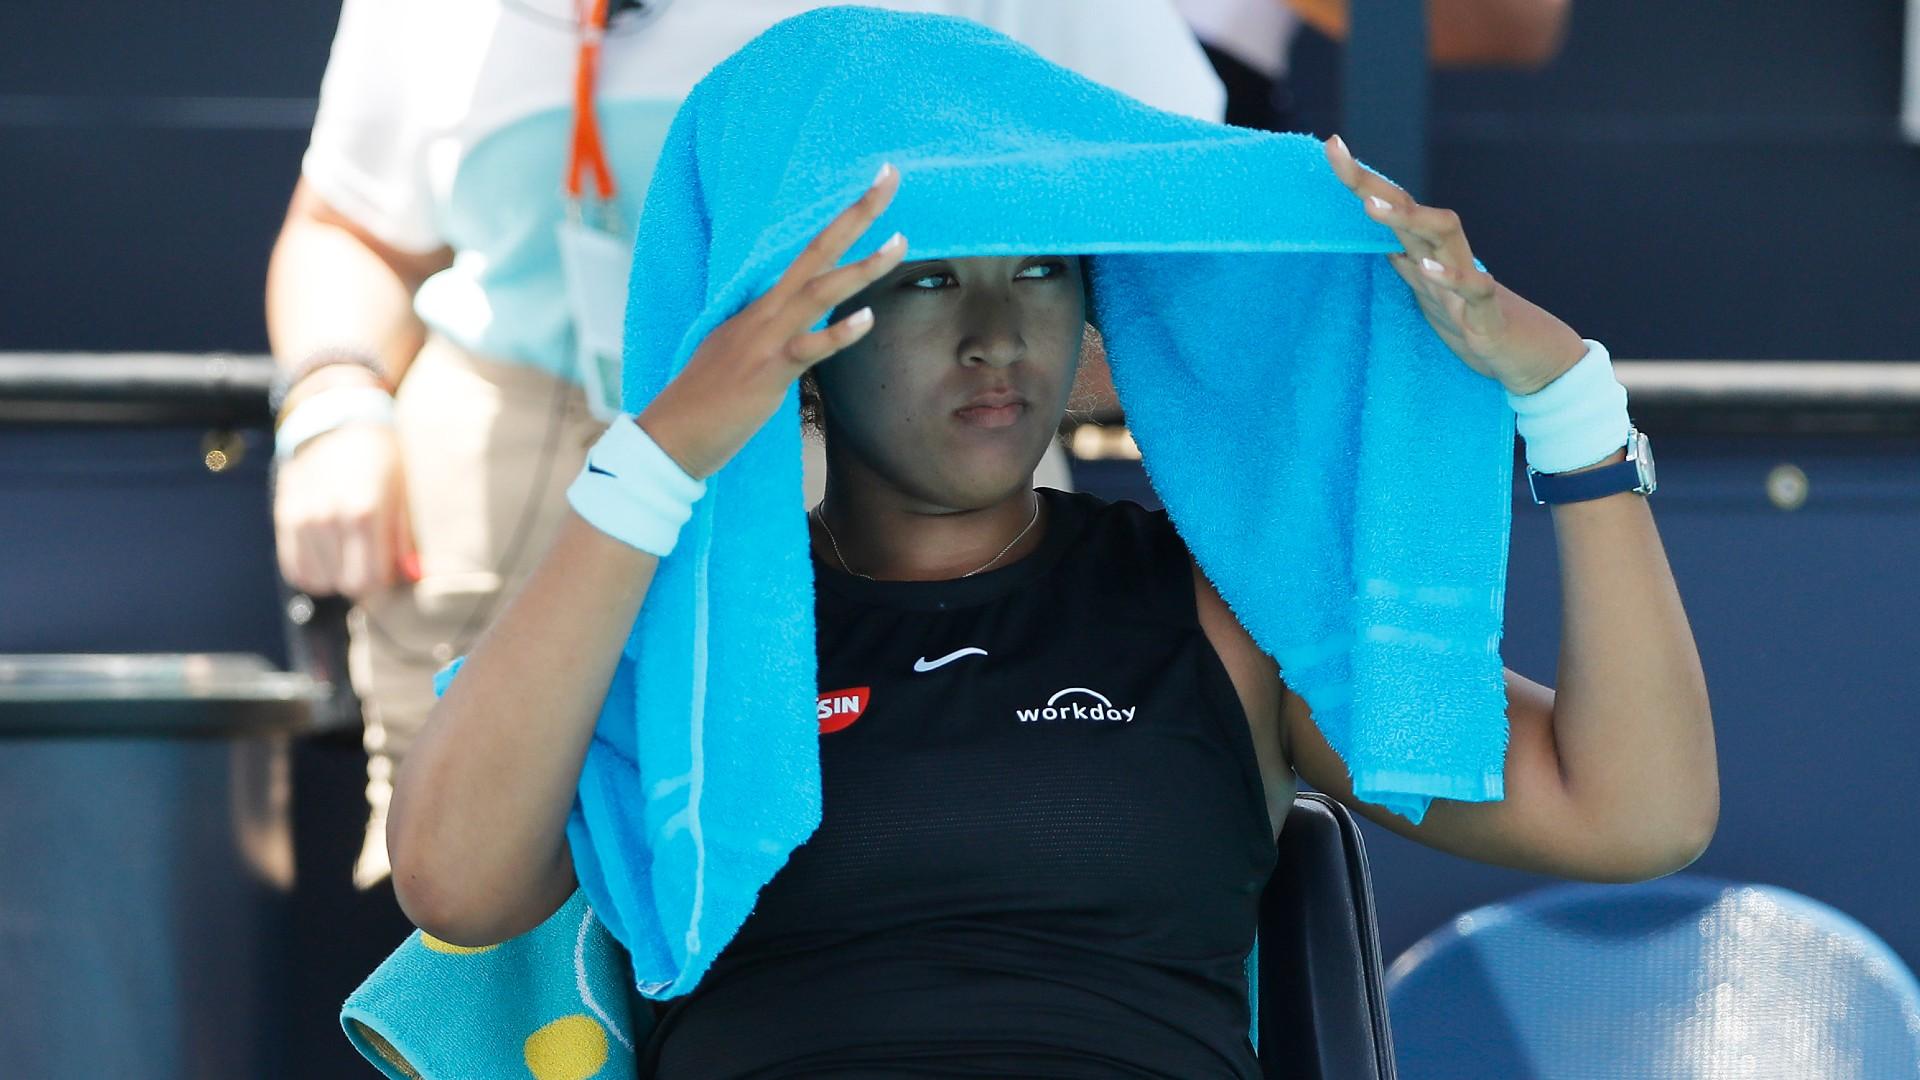 Osaka winning streak stopped by super Sakkari in Miami, Andreescu reaches semis